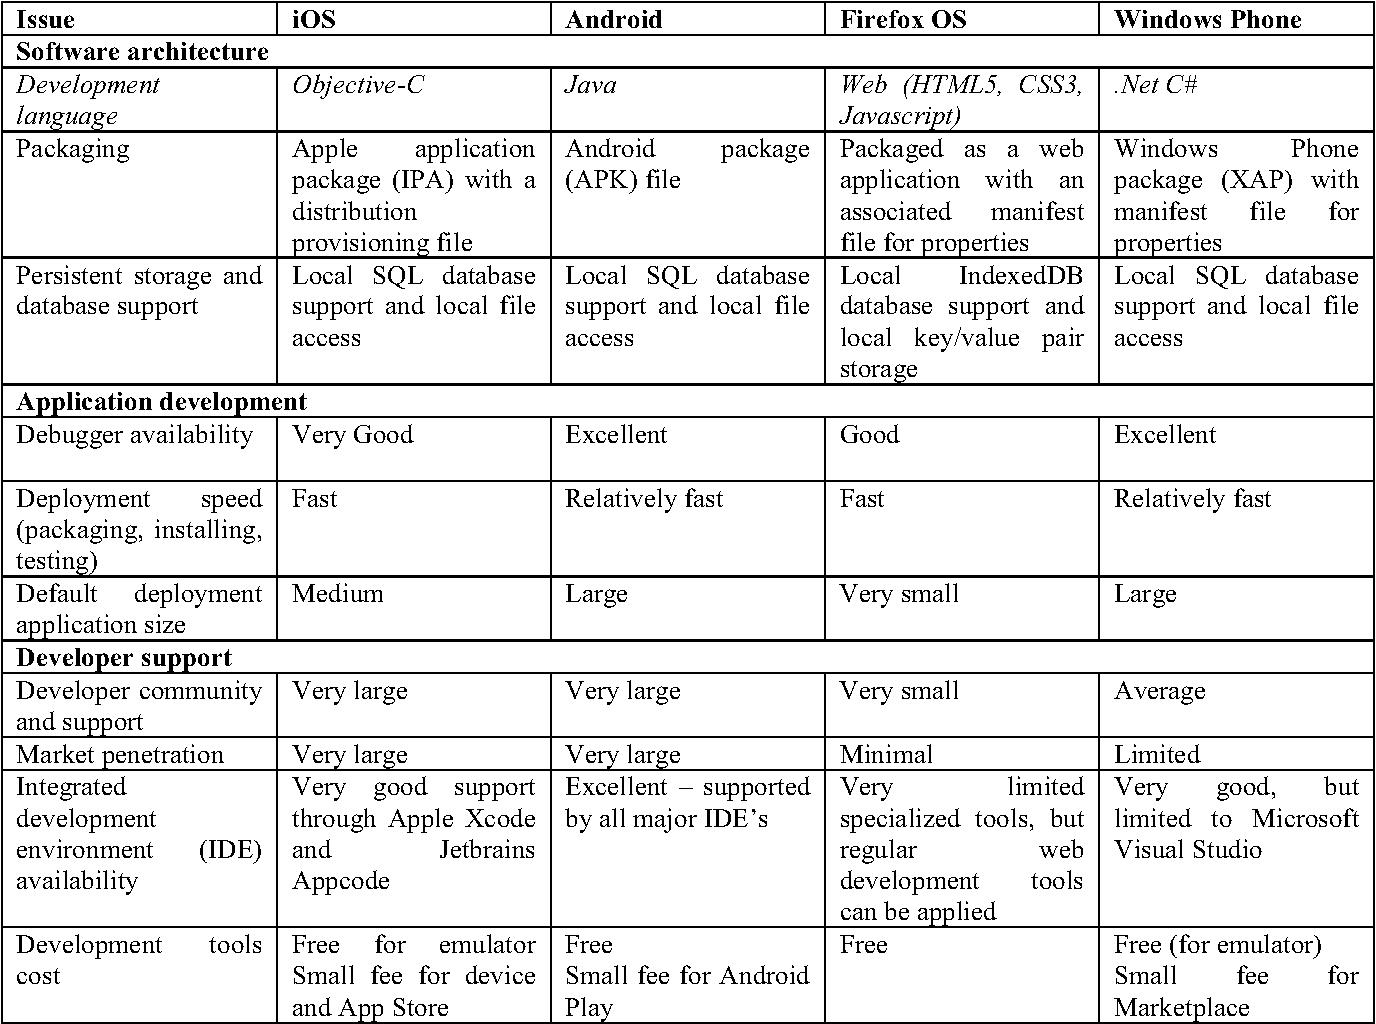 Mobile Application Platform Heterogeneity: Android vs